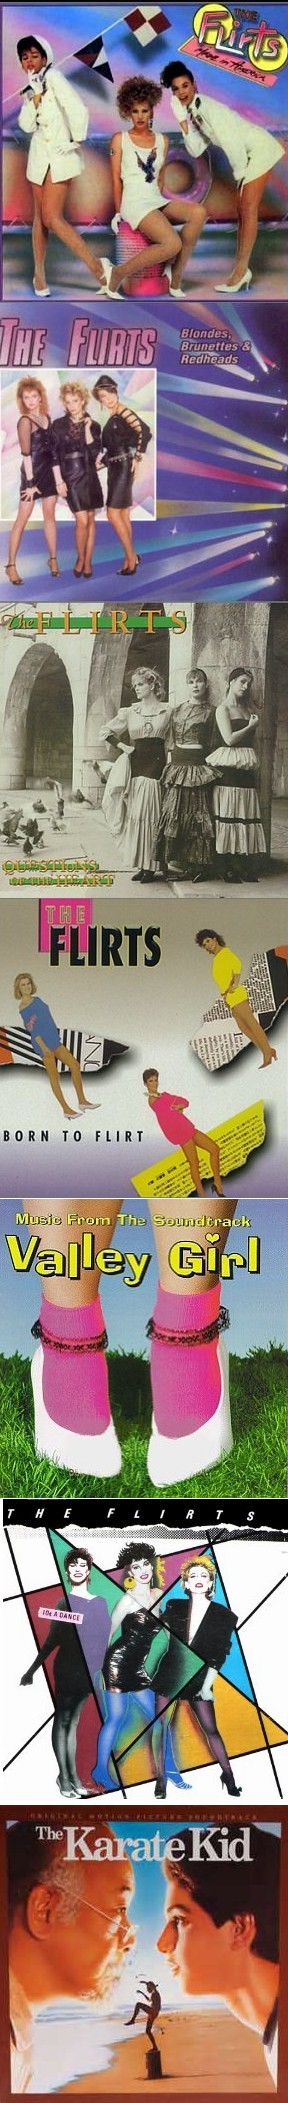 THE FLIRTS - RETROSPECT